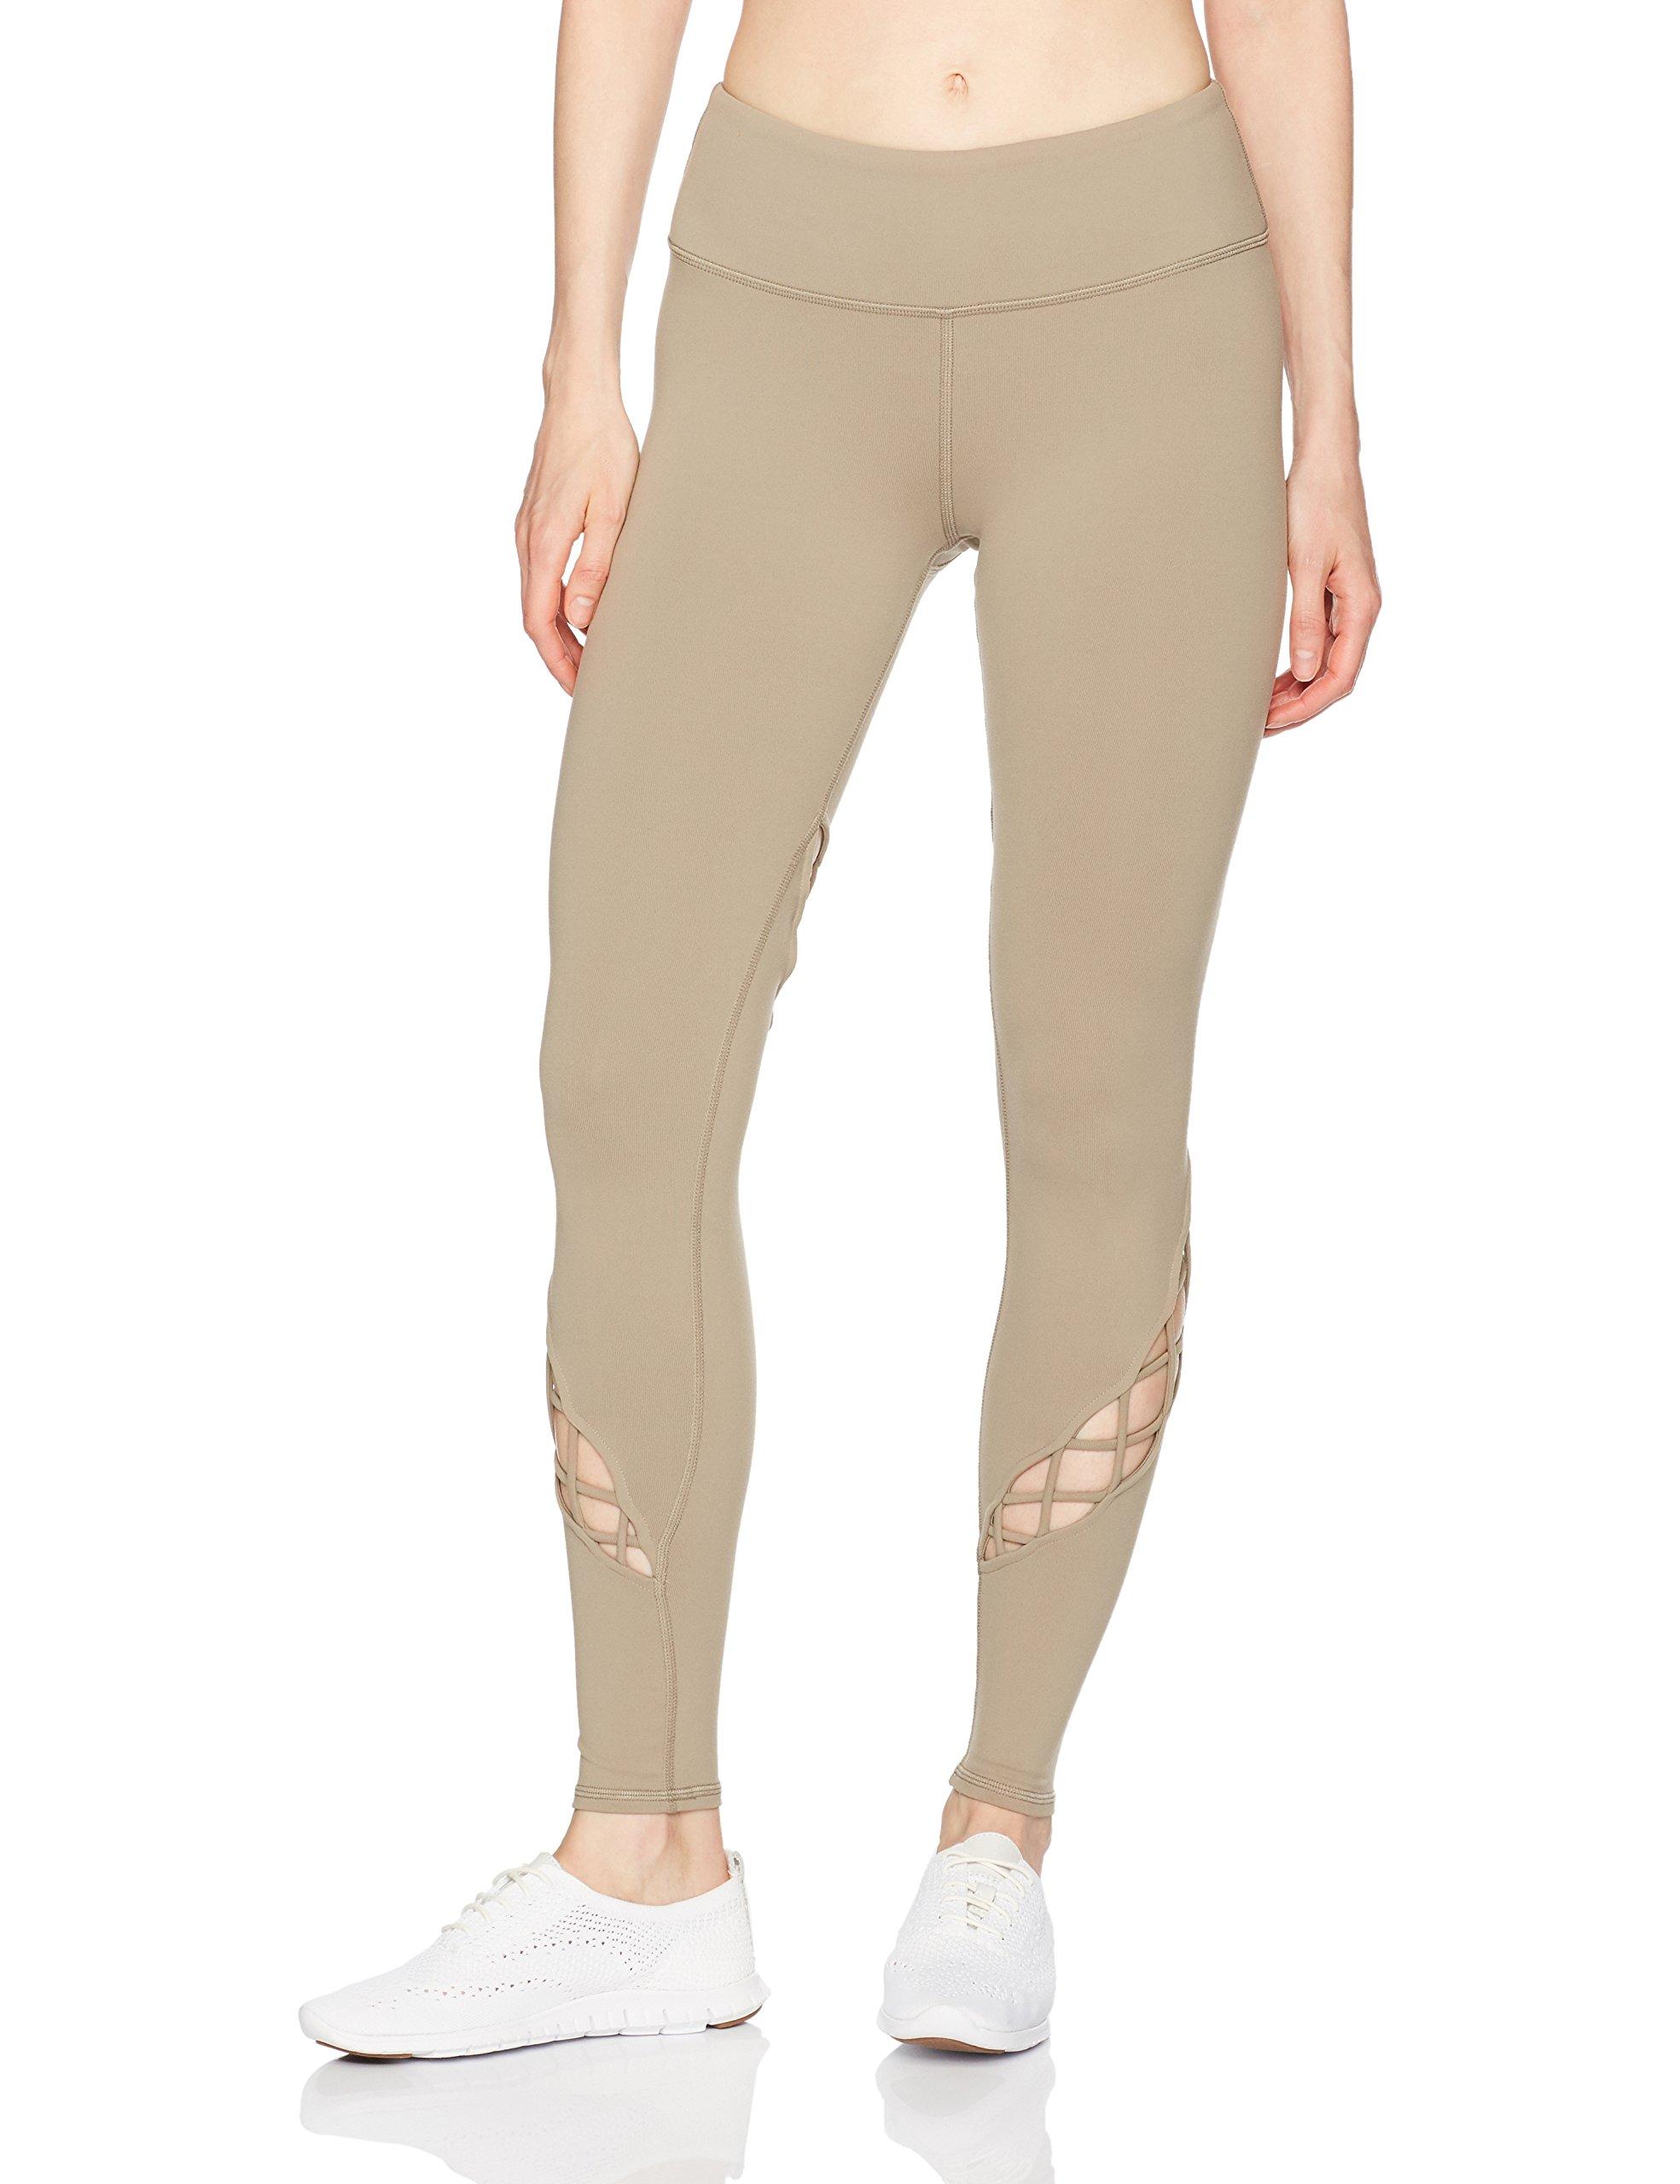 Alo Yoga Women's Entwine Legging, Gravel, XS